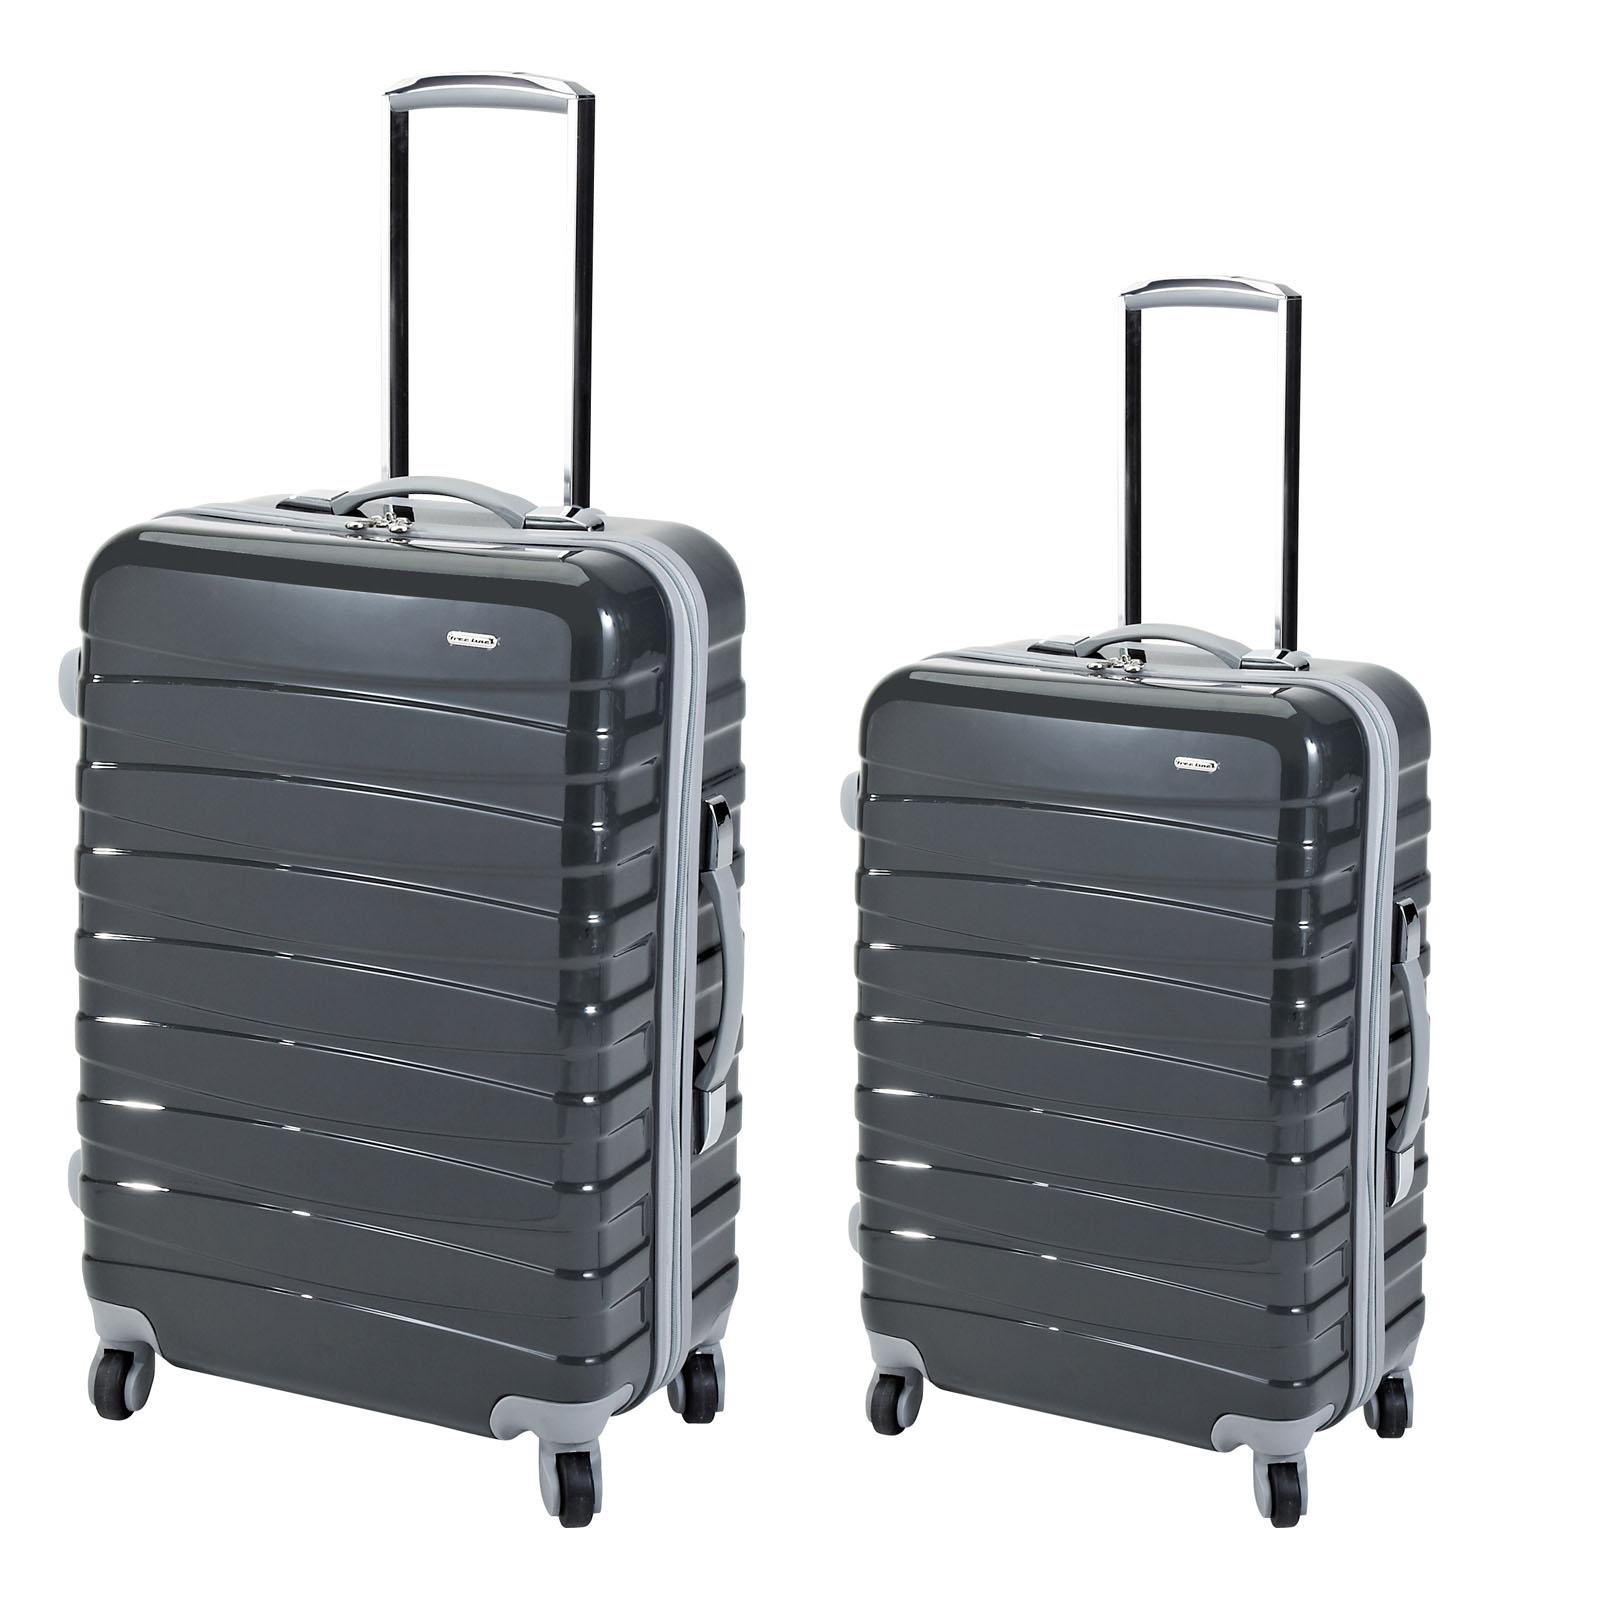 trolley personnalisable set de 2 valises trolley le sacase182 trolleys publicitaires. Black Bedroom Furniture Sets. Home Design Ideas